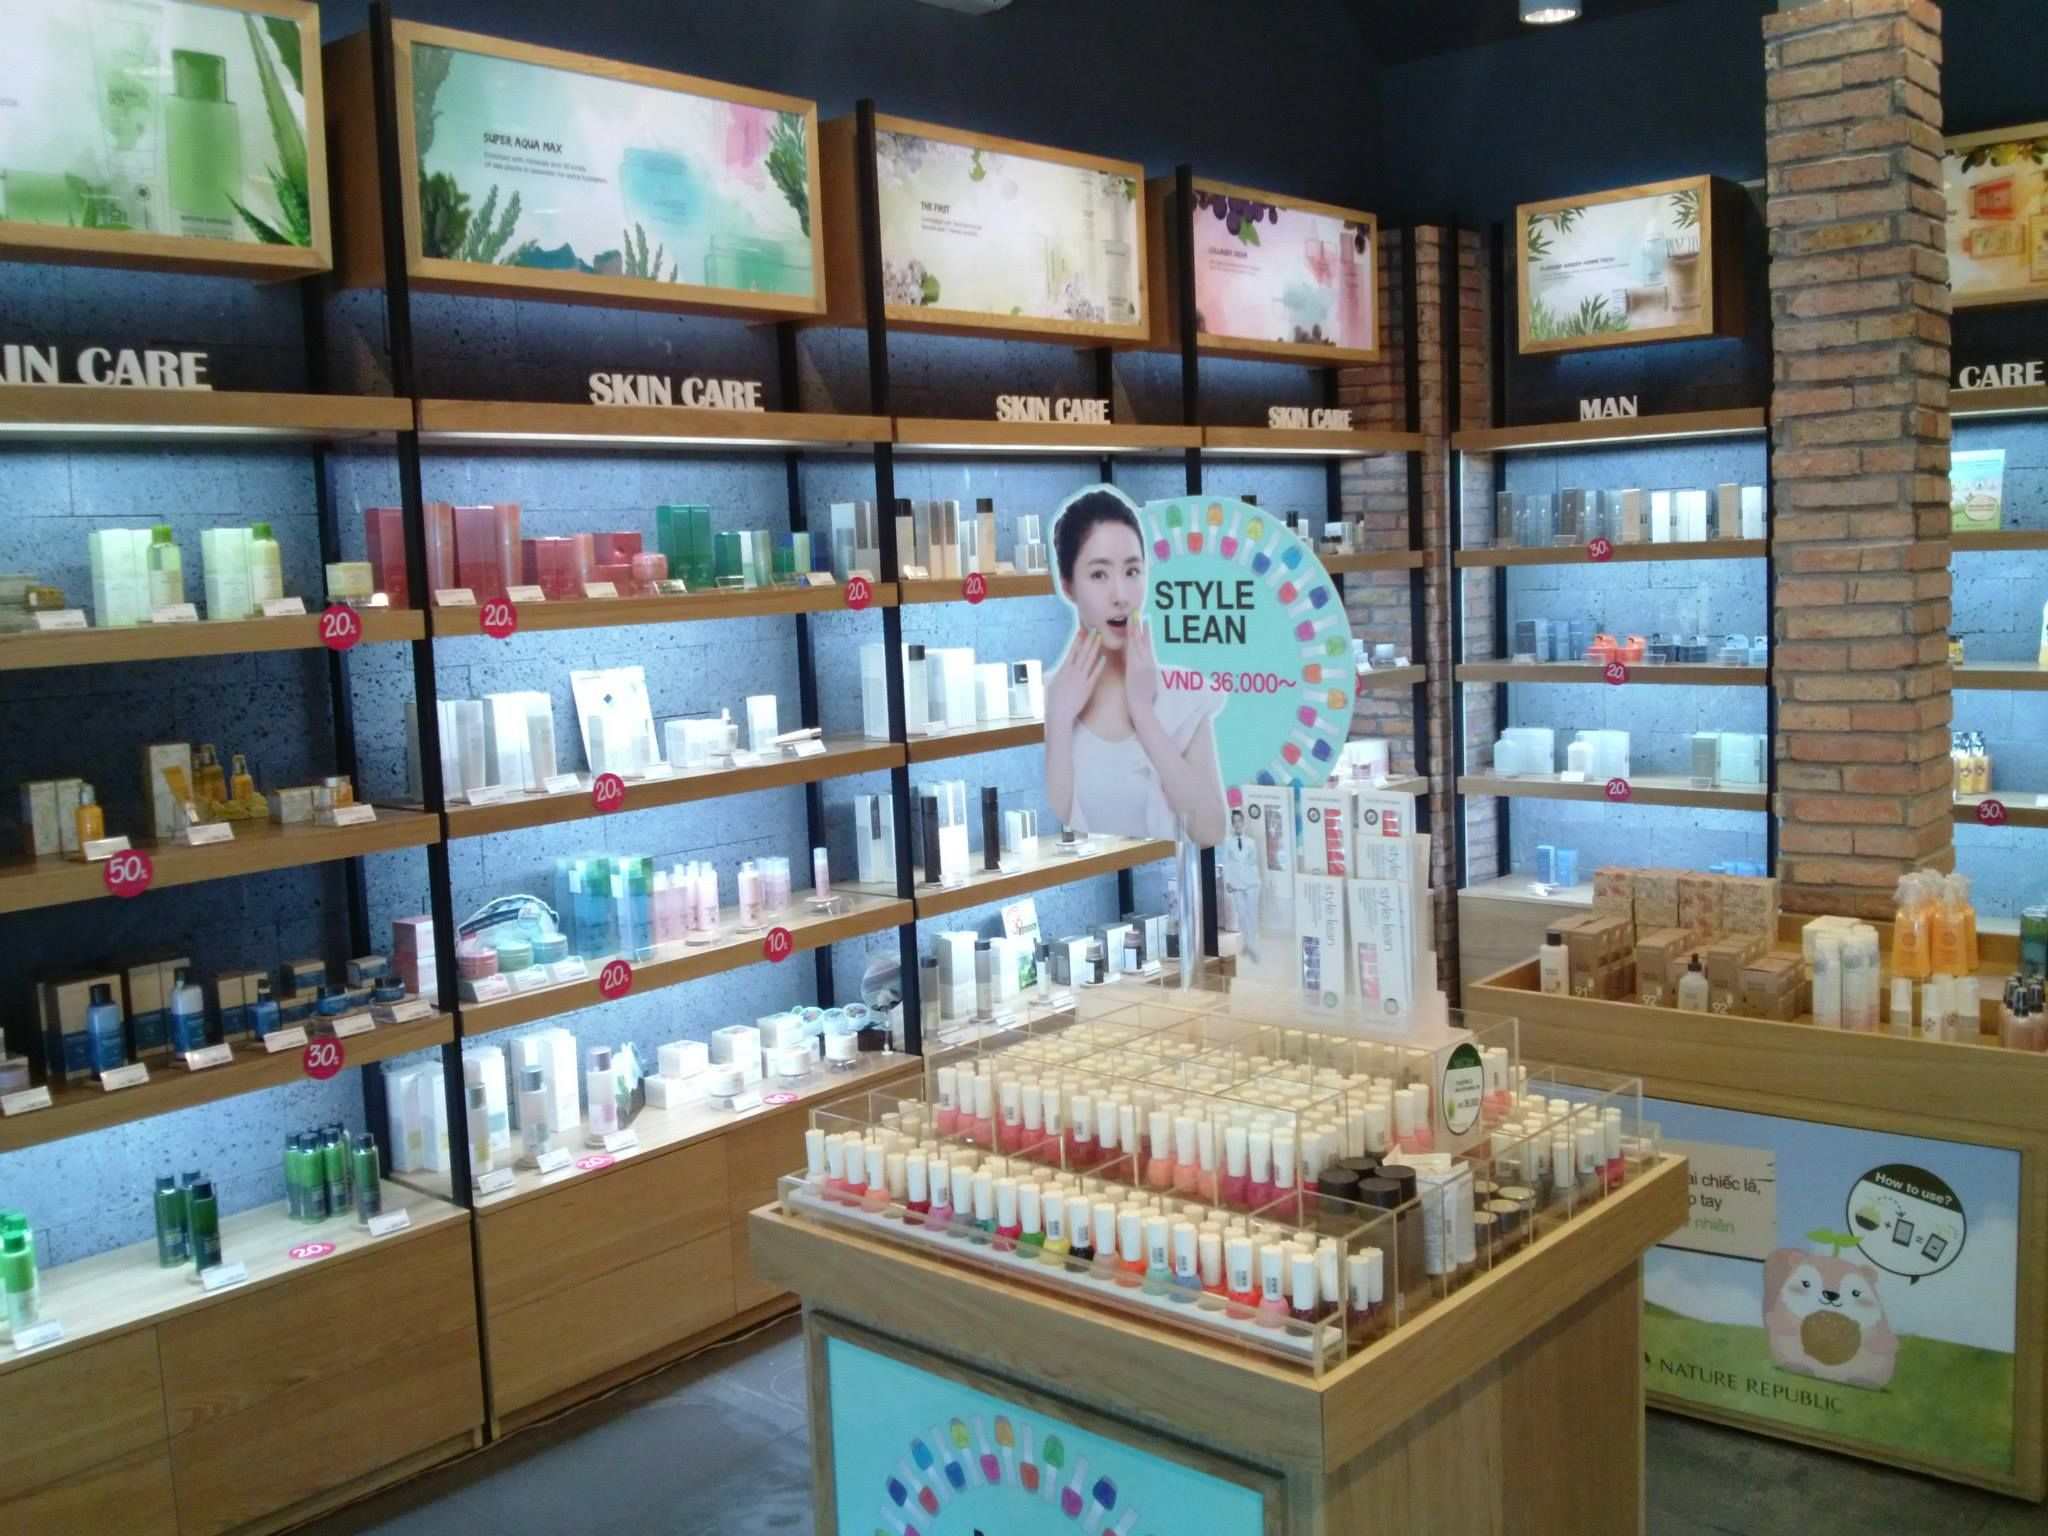 Above a display of sheet masks at a Korean cosmetic store